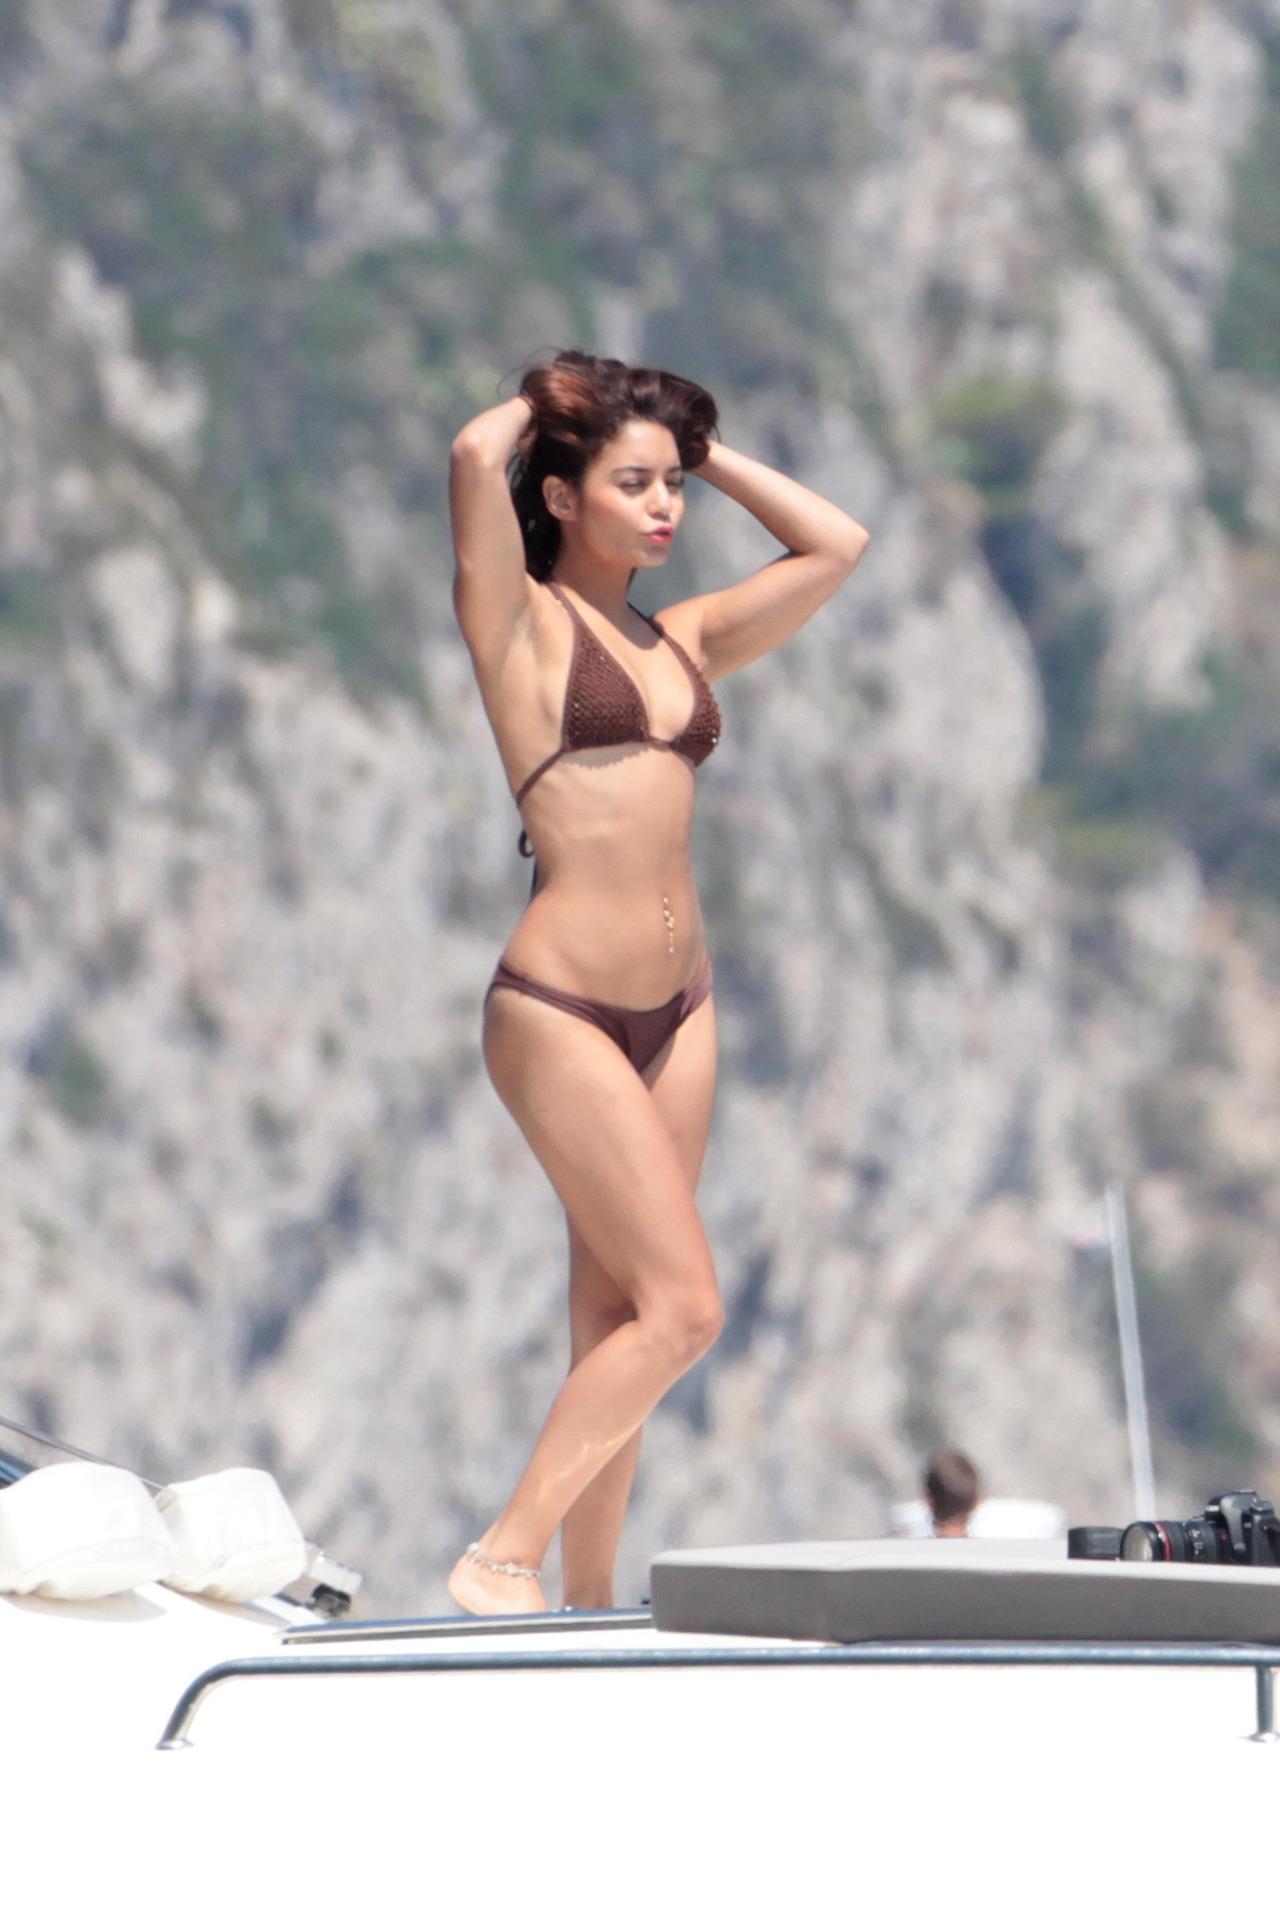 Vennessa hutchins en bikini